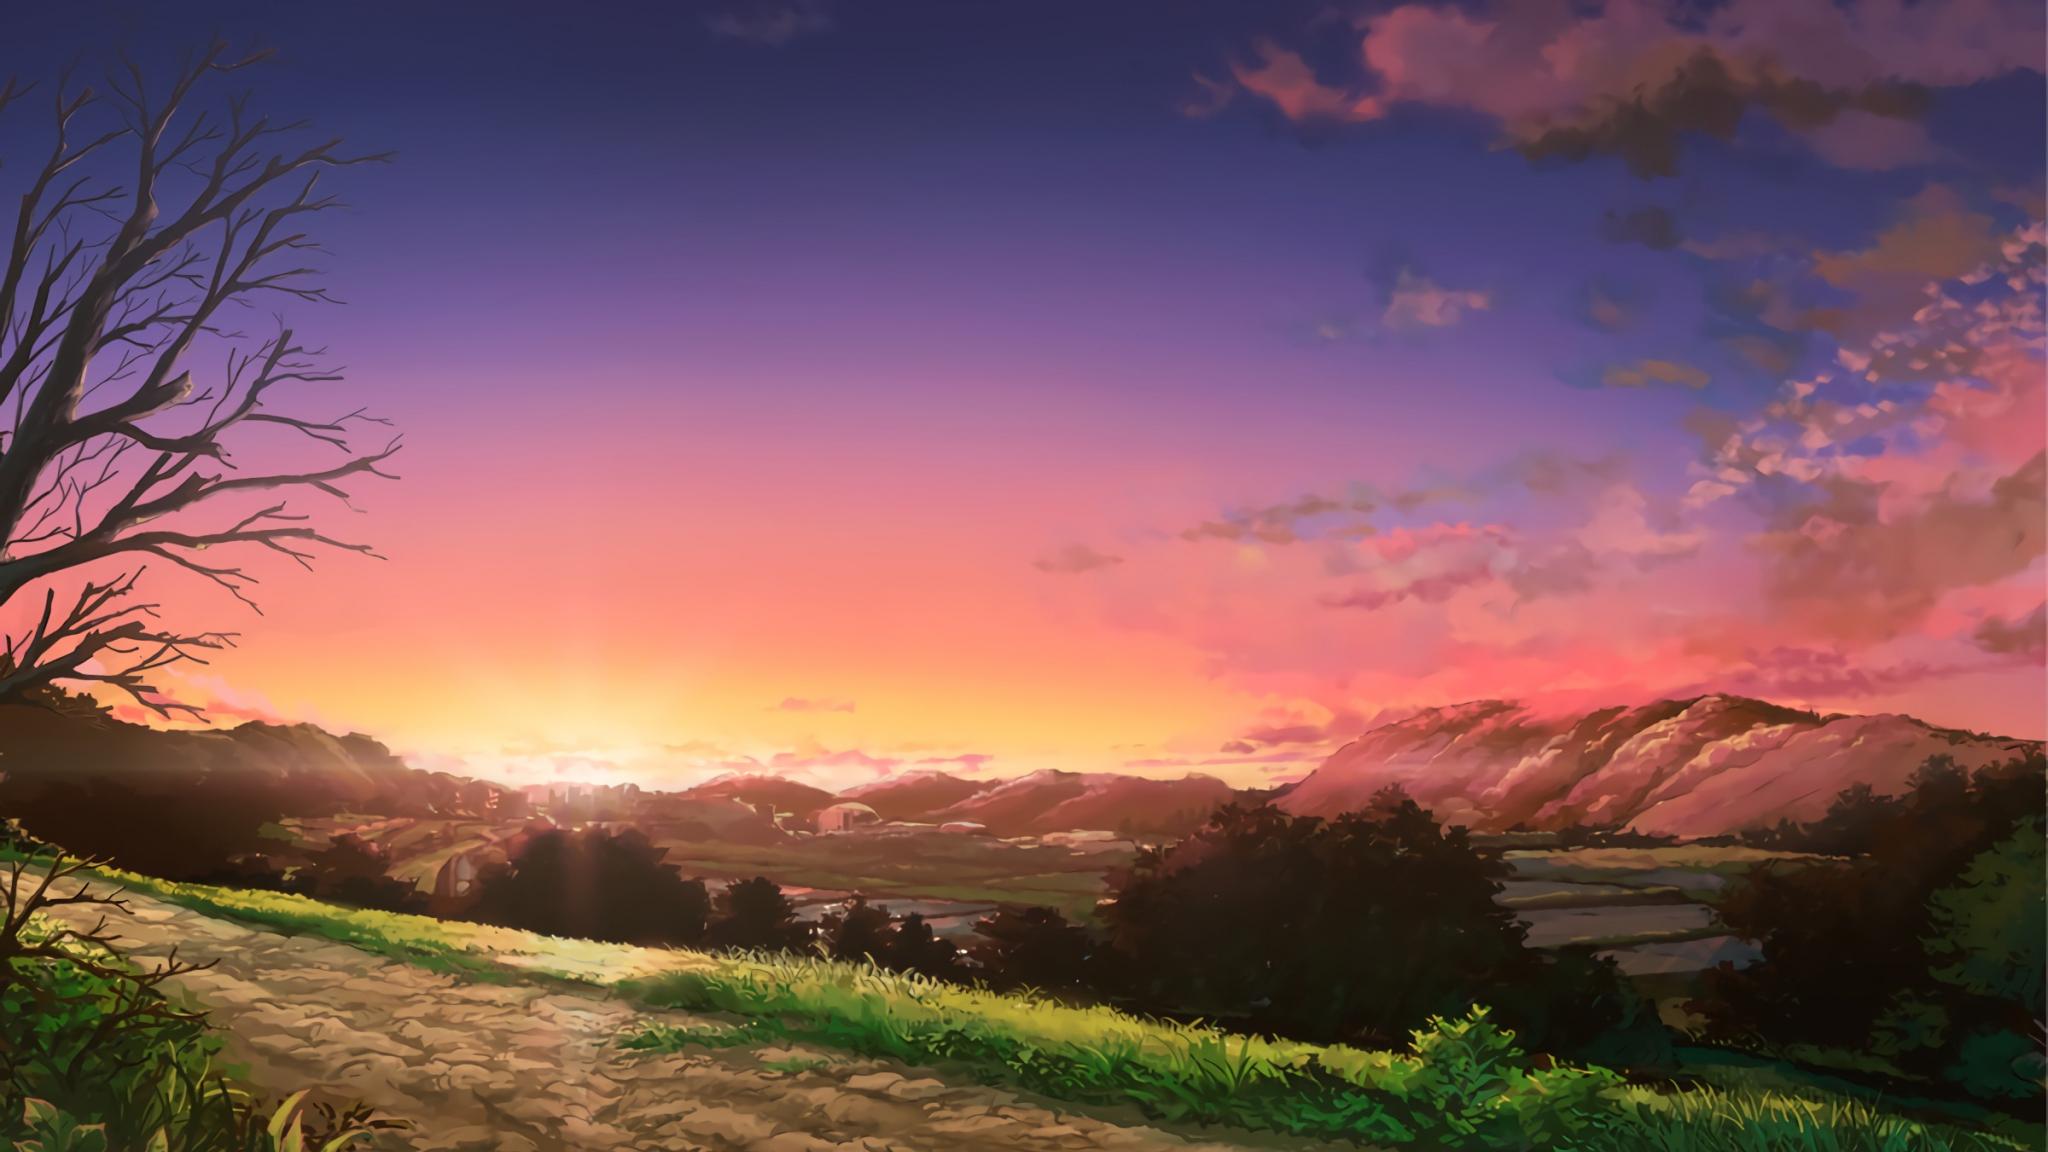 Desktop Wallpaper Anime Nature Digital Art Hd Image Picture Background 803b60